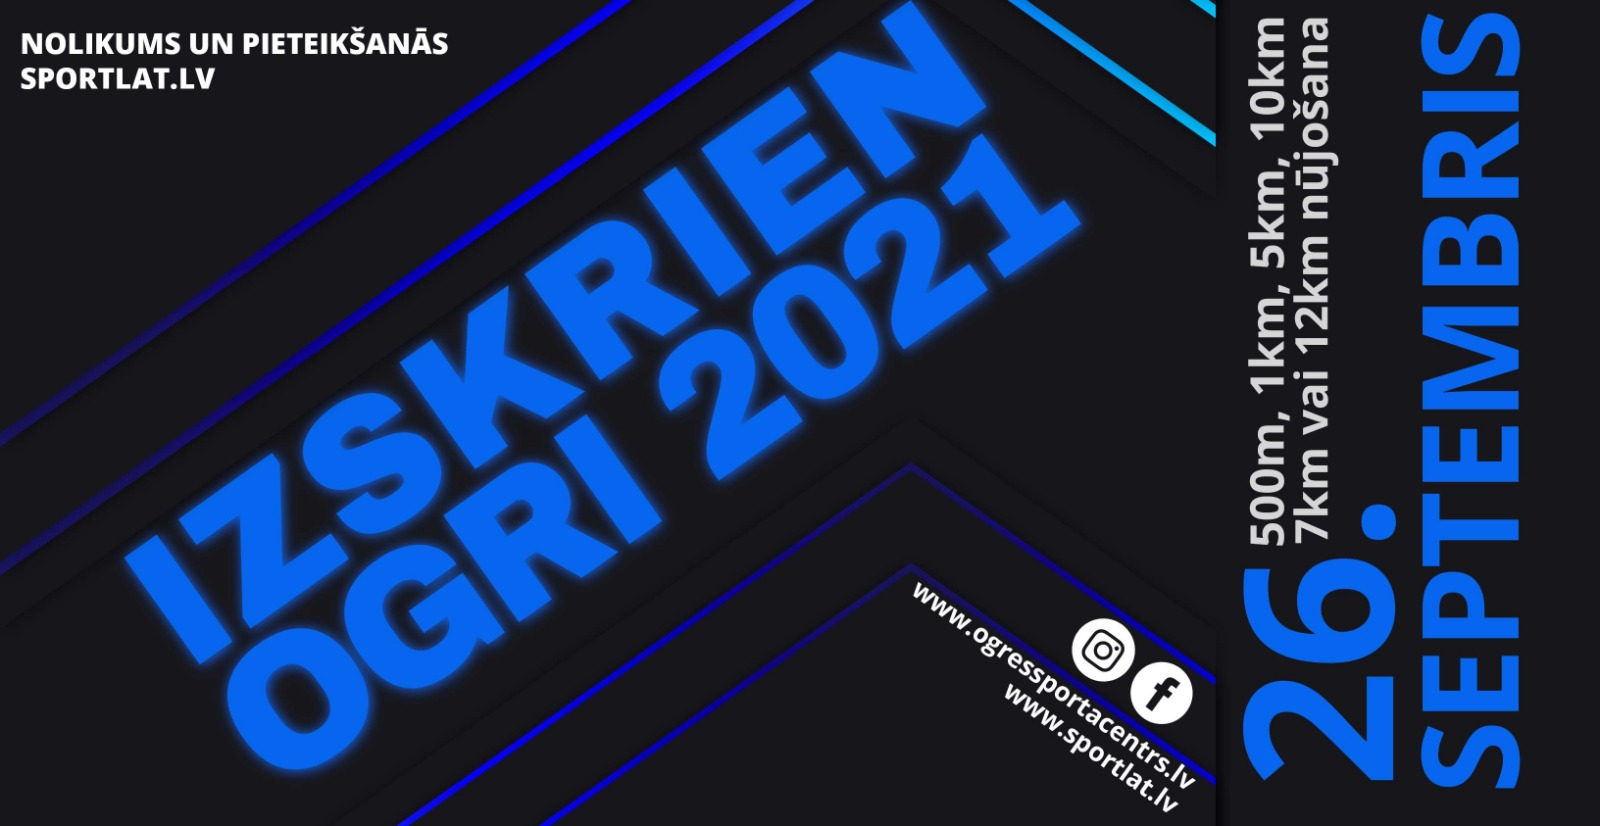 Izskrien Ogri 2021